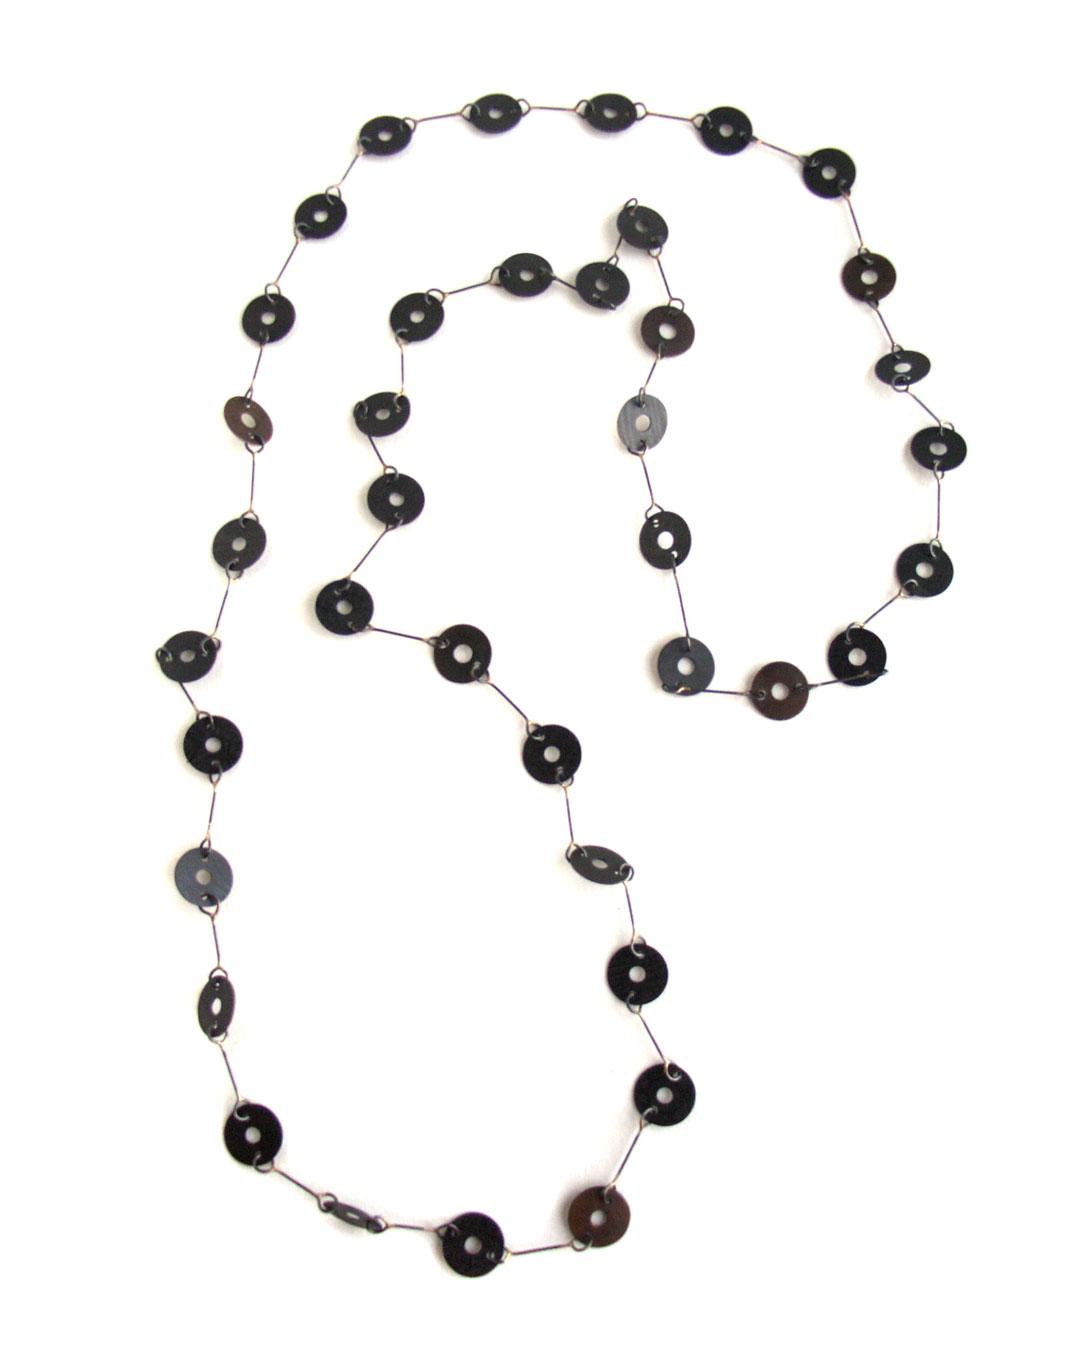 Tore Svensson, untitled, 2005, necklace; steel, partly gilt, 600 mm, €1480